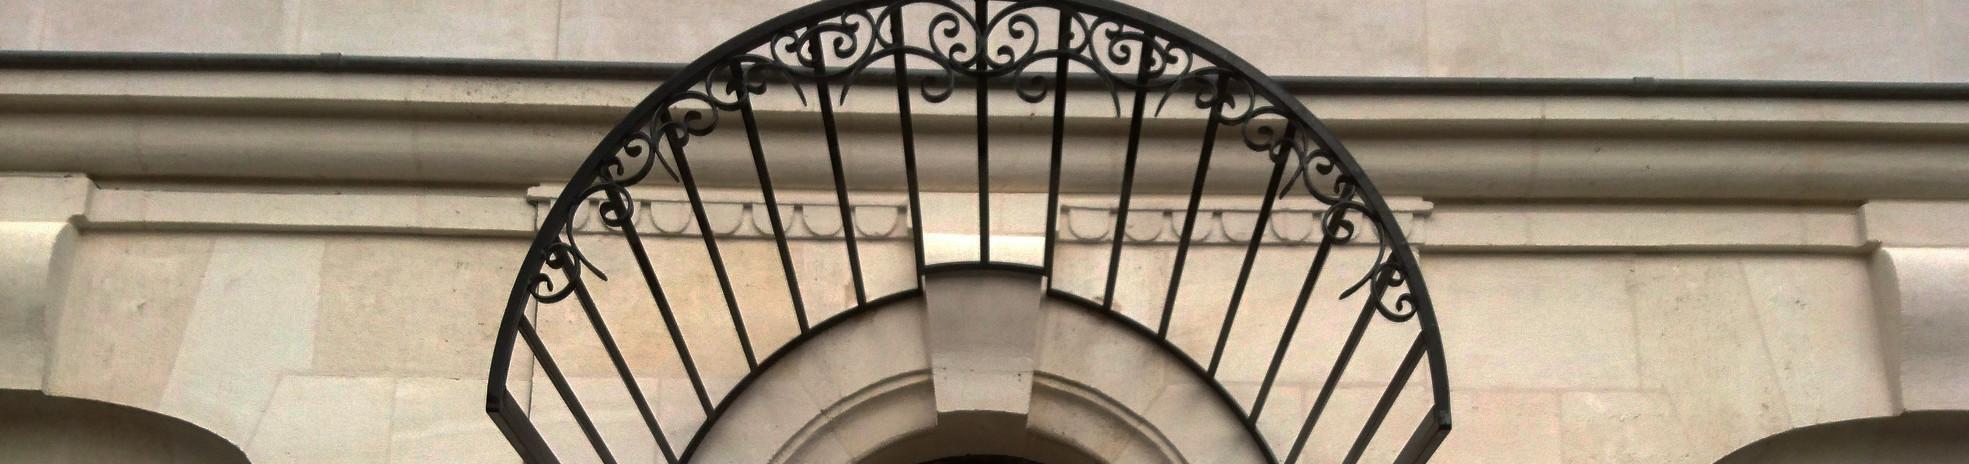 travaux-metallerie-portail-cloture-rampe-sur-mesure